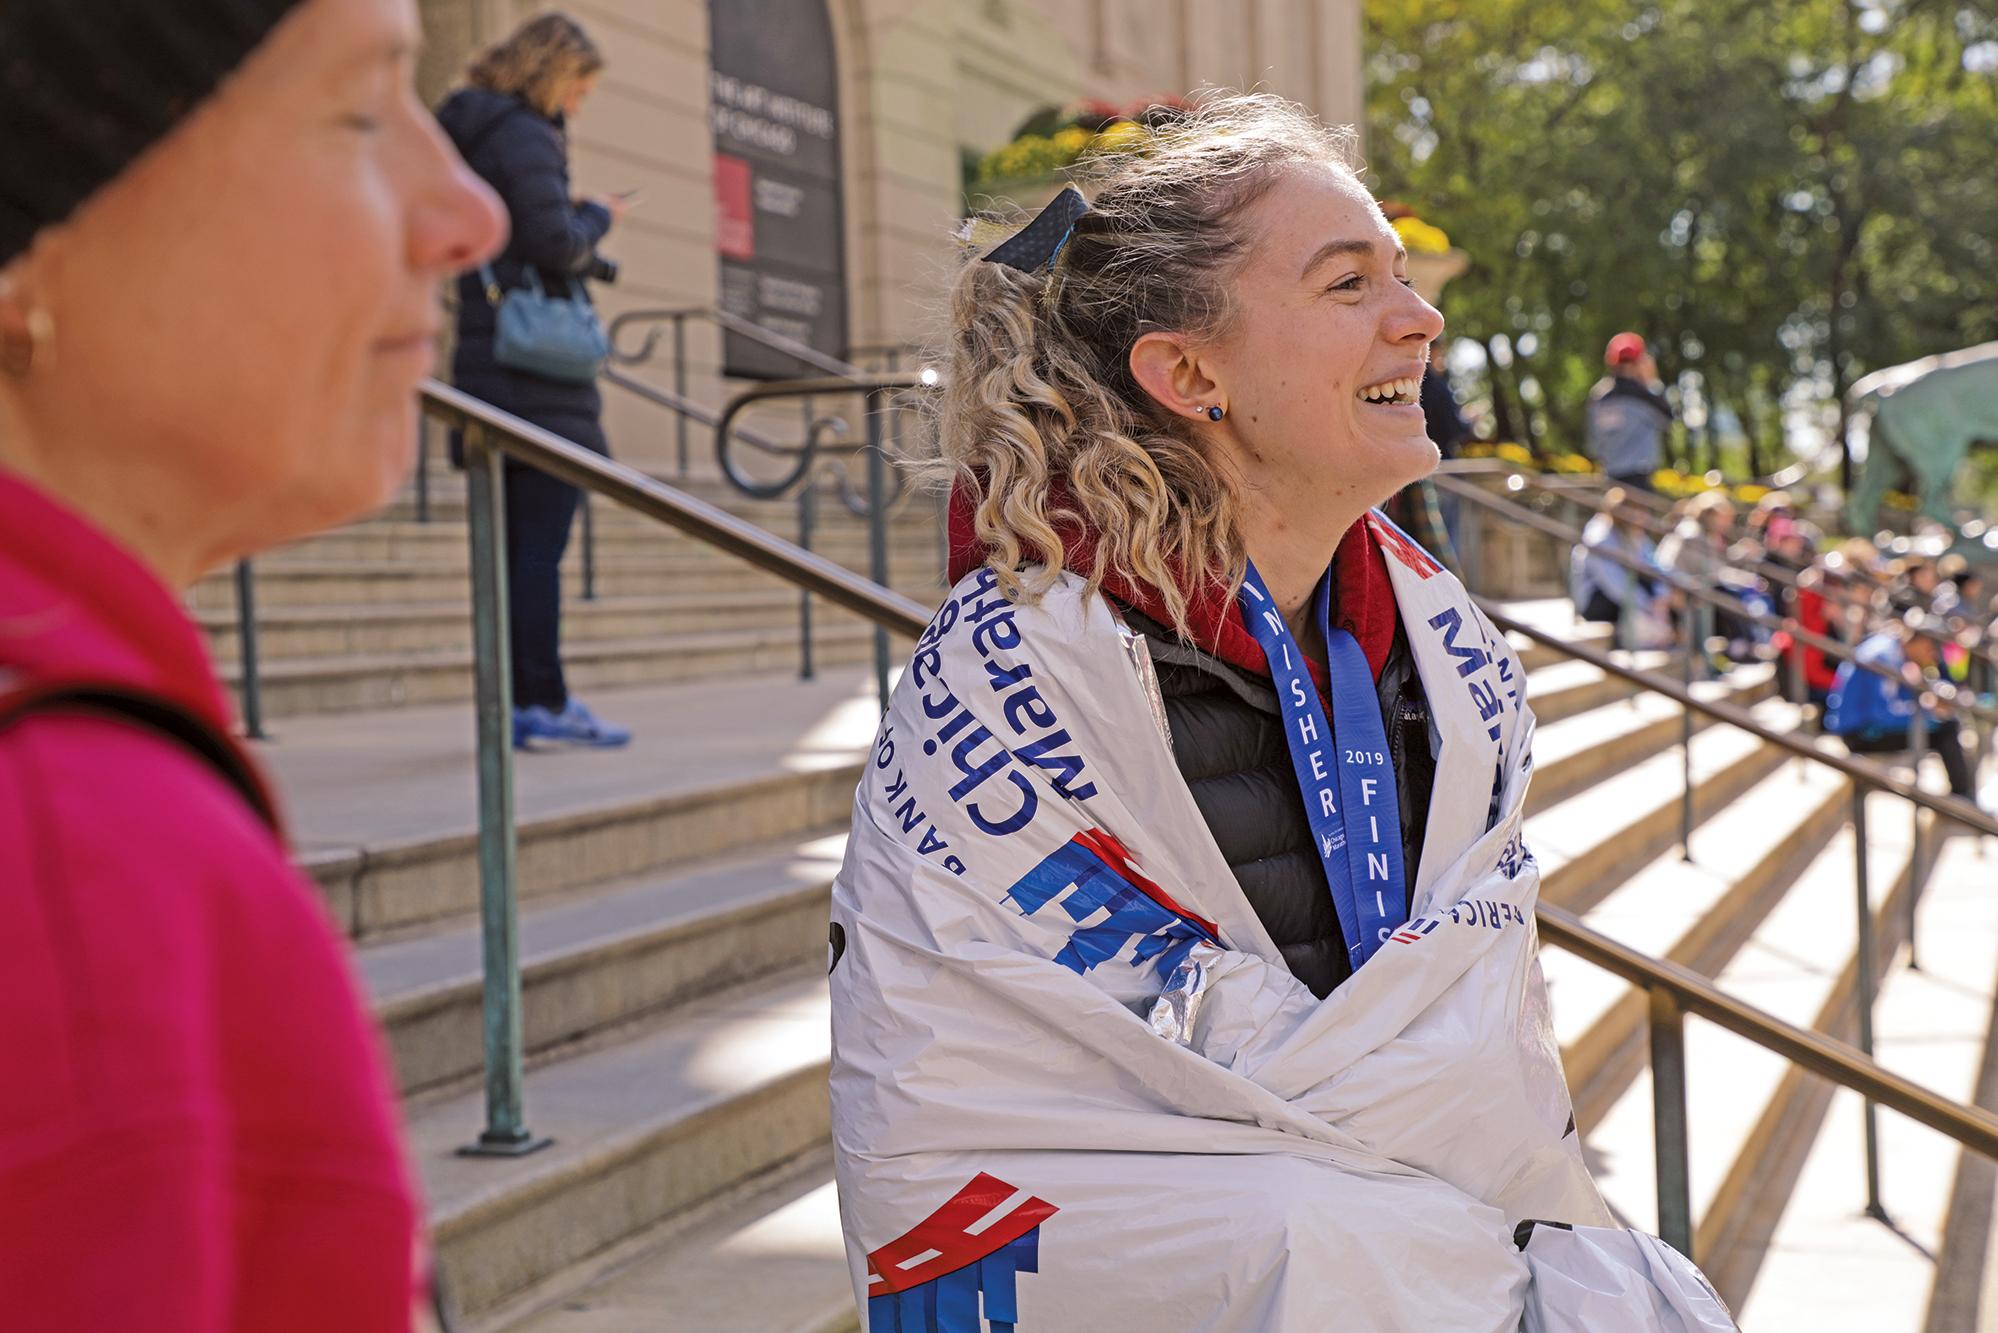 A side profile of Megan Cunningham after her race.